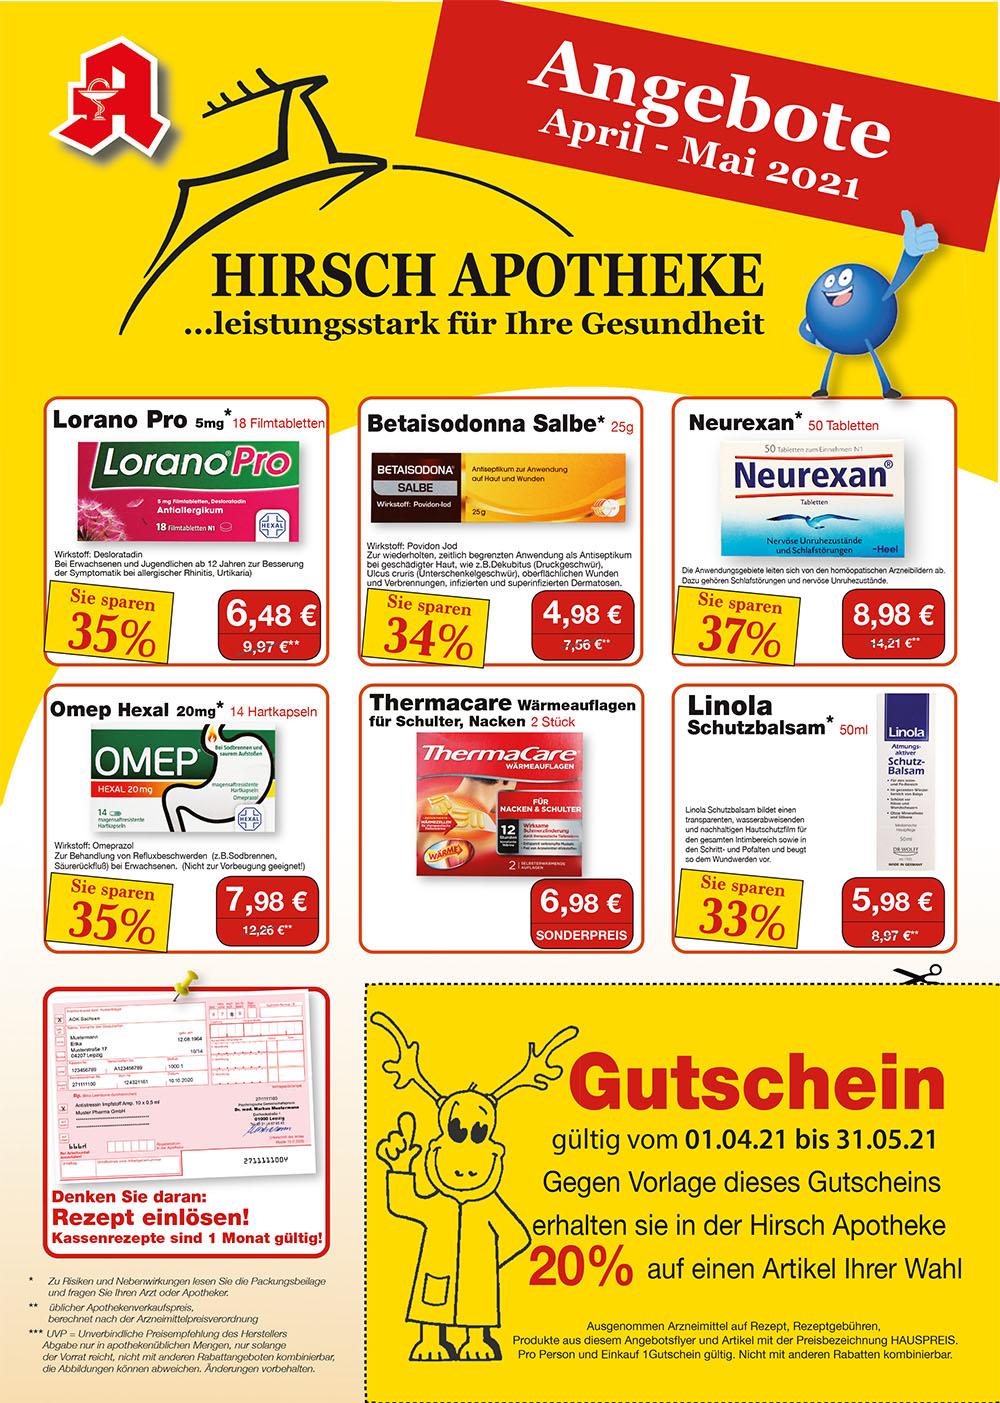 https://www-apotheken-de.apocdn.net/fileadmin/clubarea/00000-Angebote/04207_17440_hirsch_angebot_2.jpg